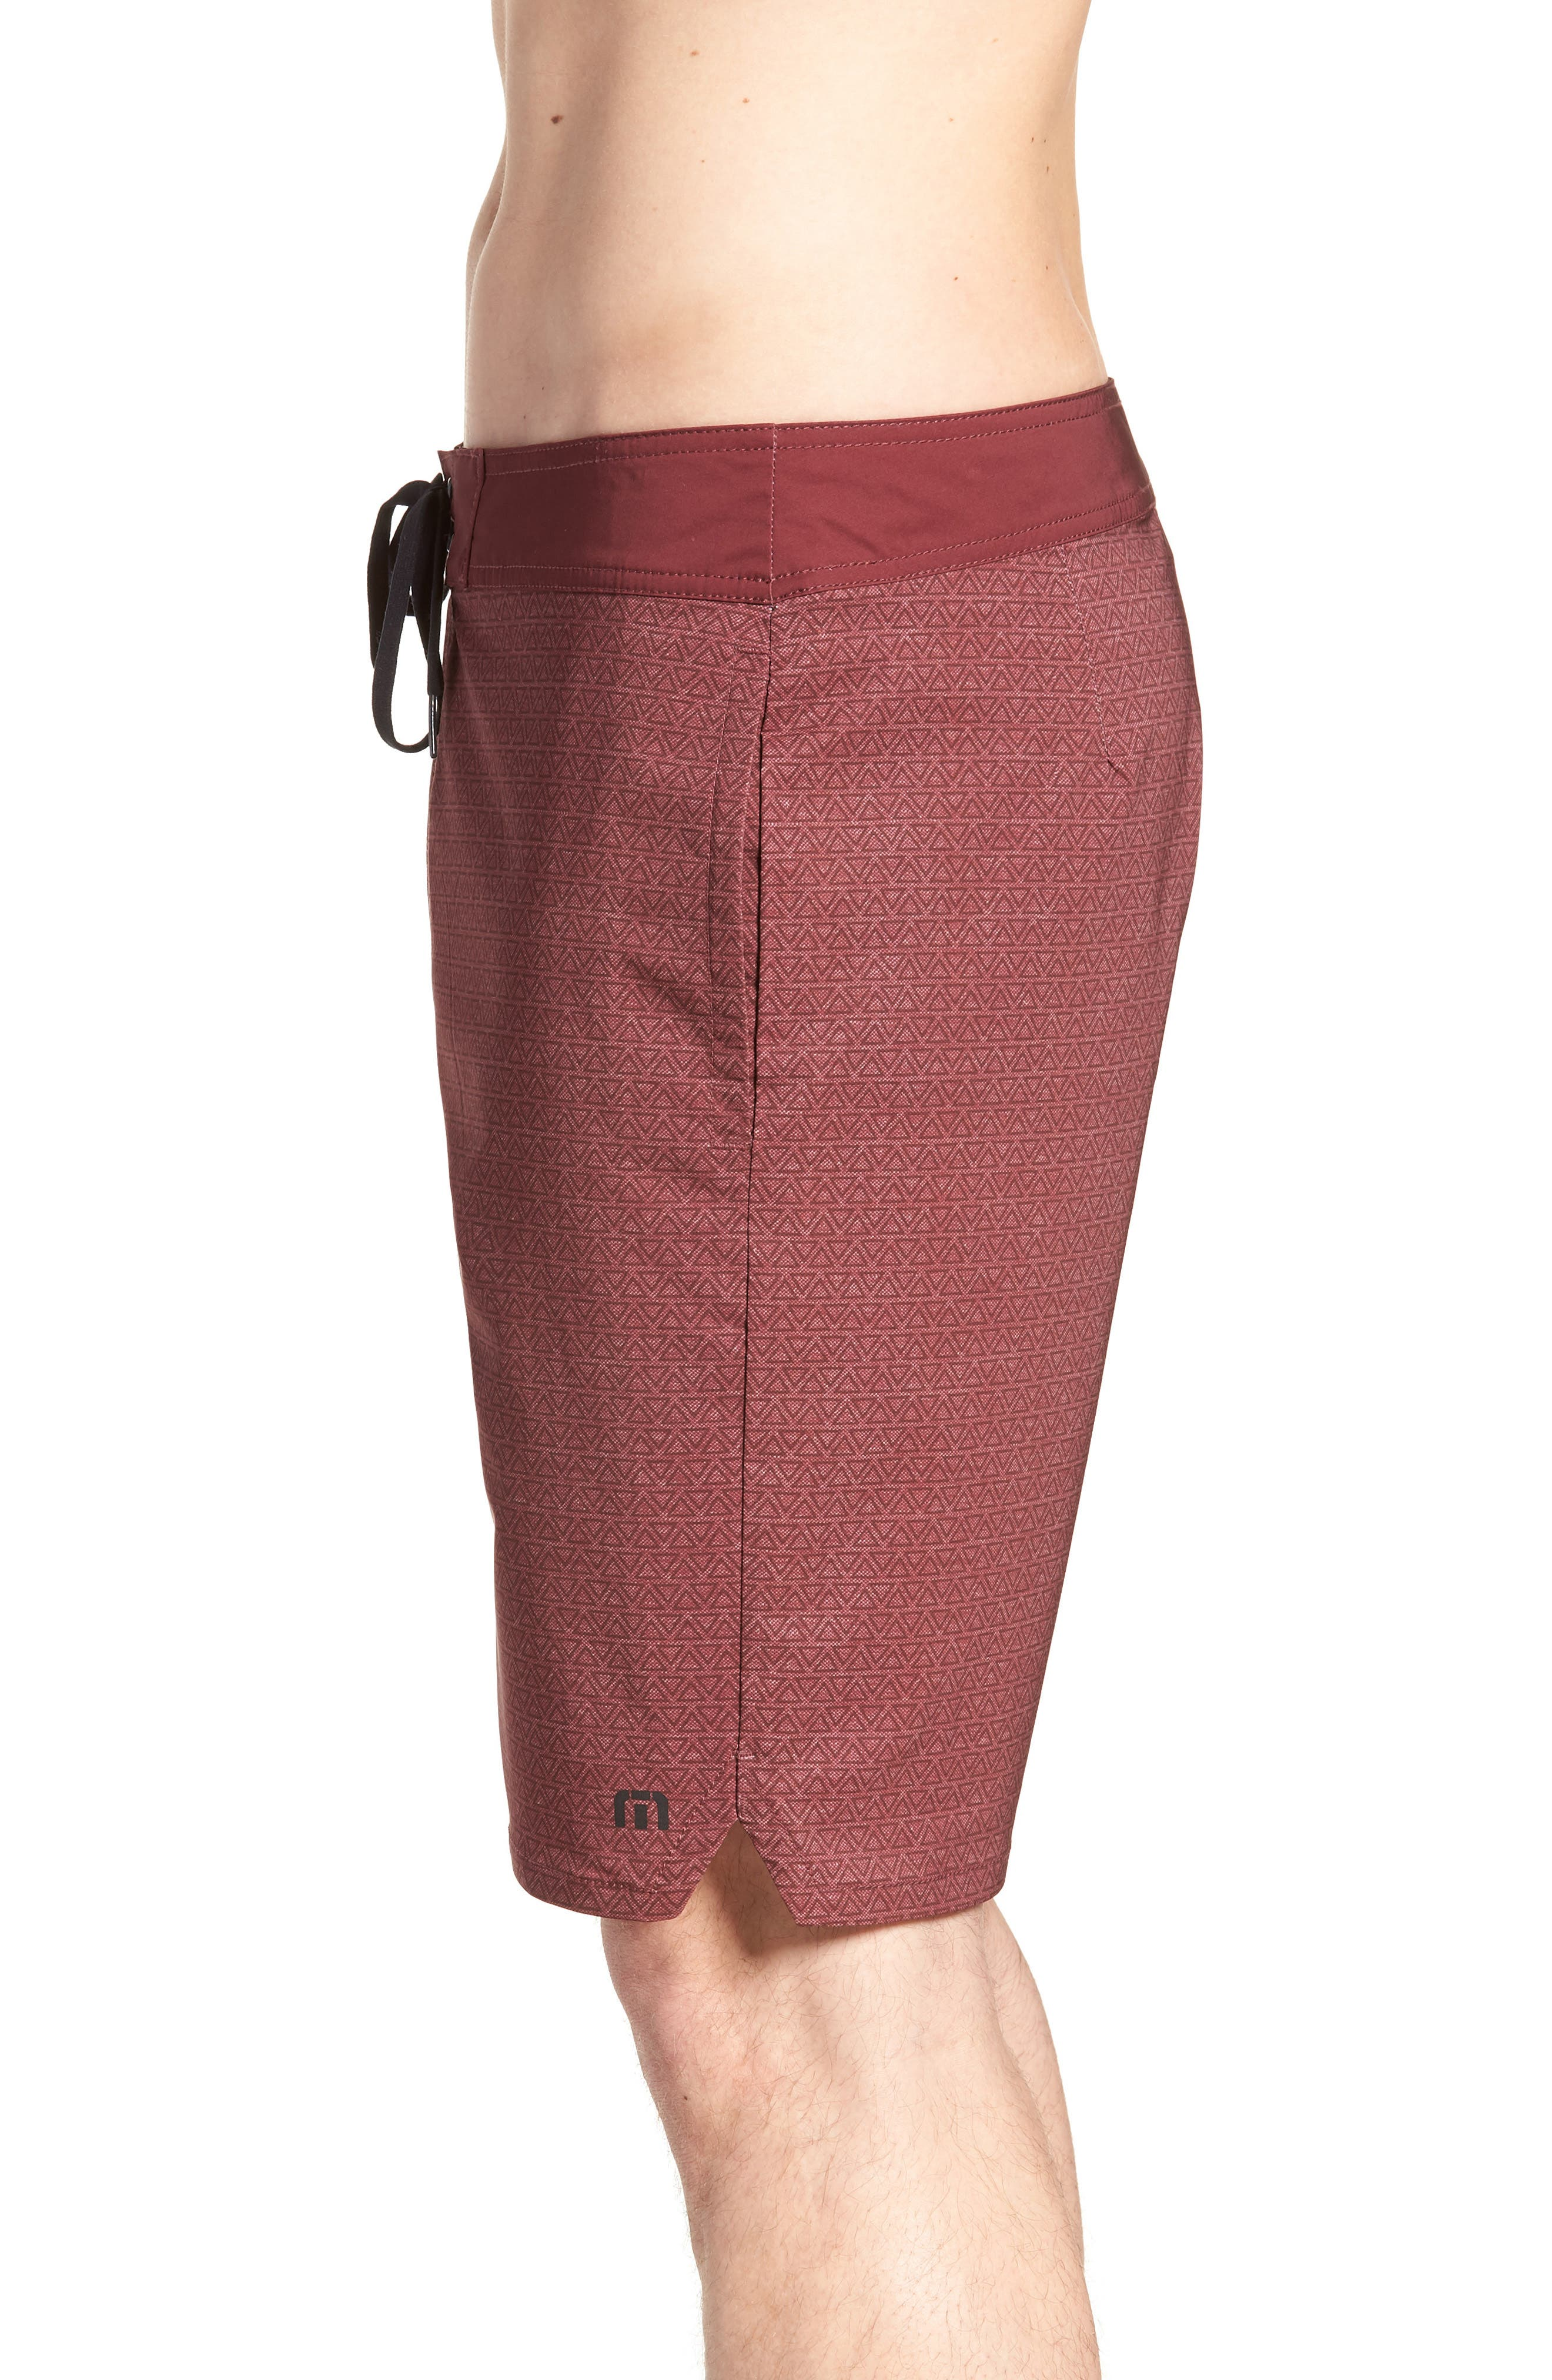 Blanders Regular Fit Board Shorts,                             Alternate thumbnail 3, color,                             Oxblood